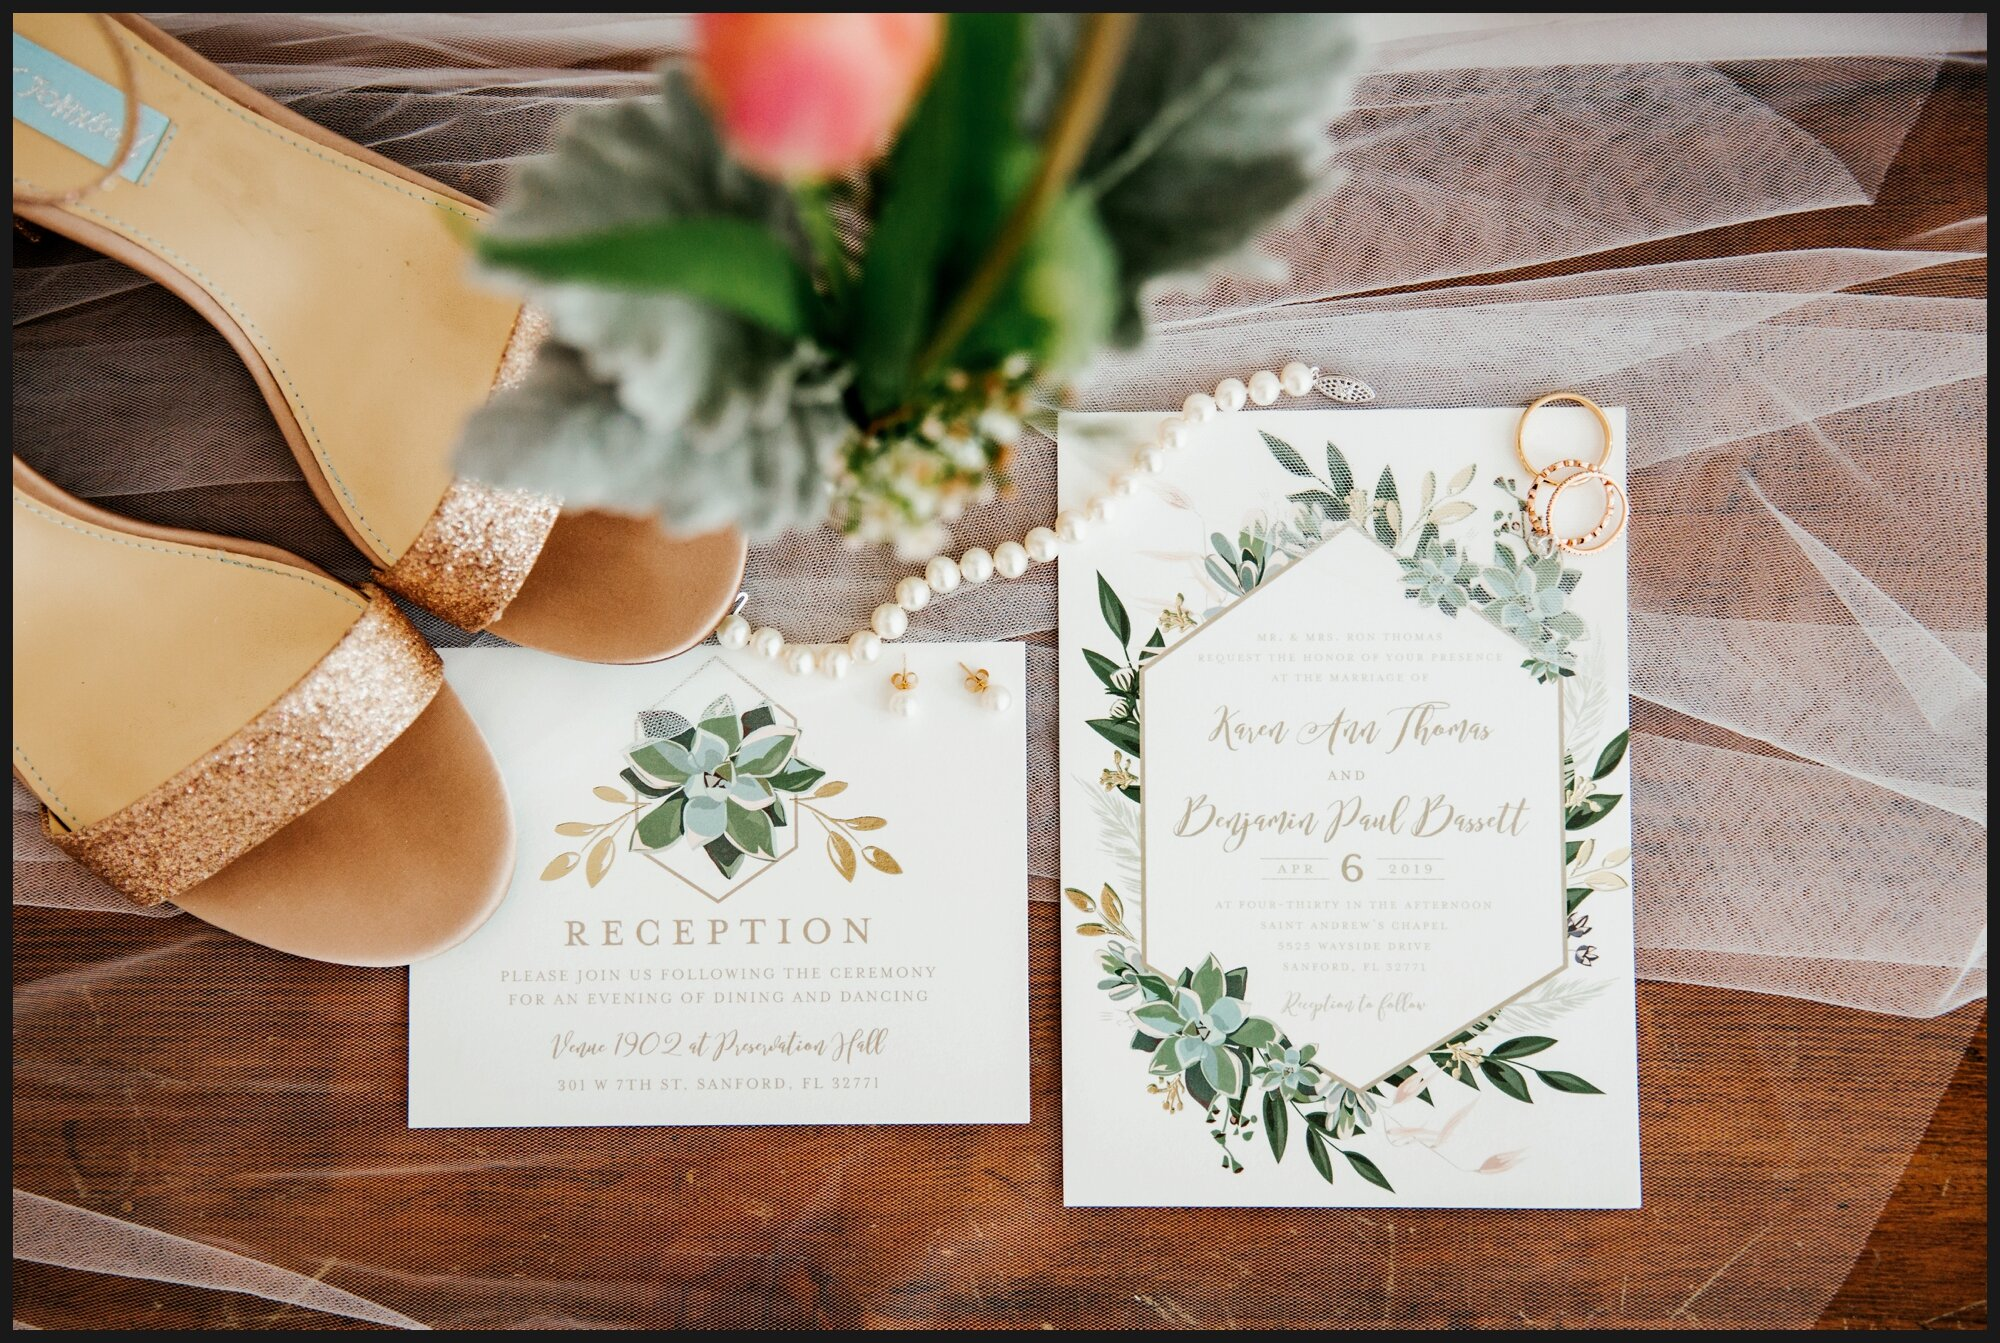 Orlando-Wedding-Photographer-destination-wedding-photographer-florida-wedding-photographer-hawaii-wedding-photographer_0638.jpg